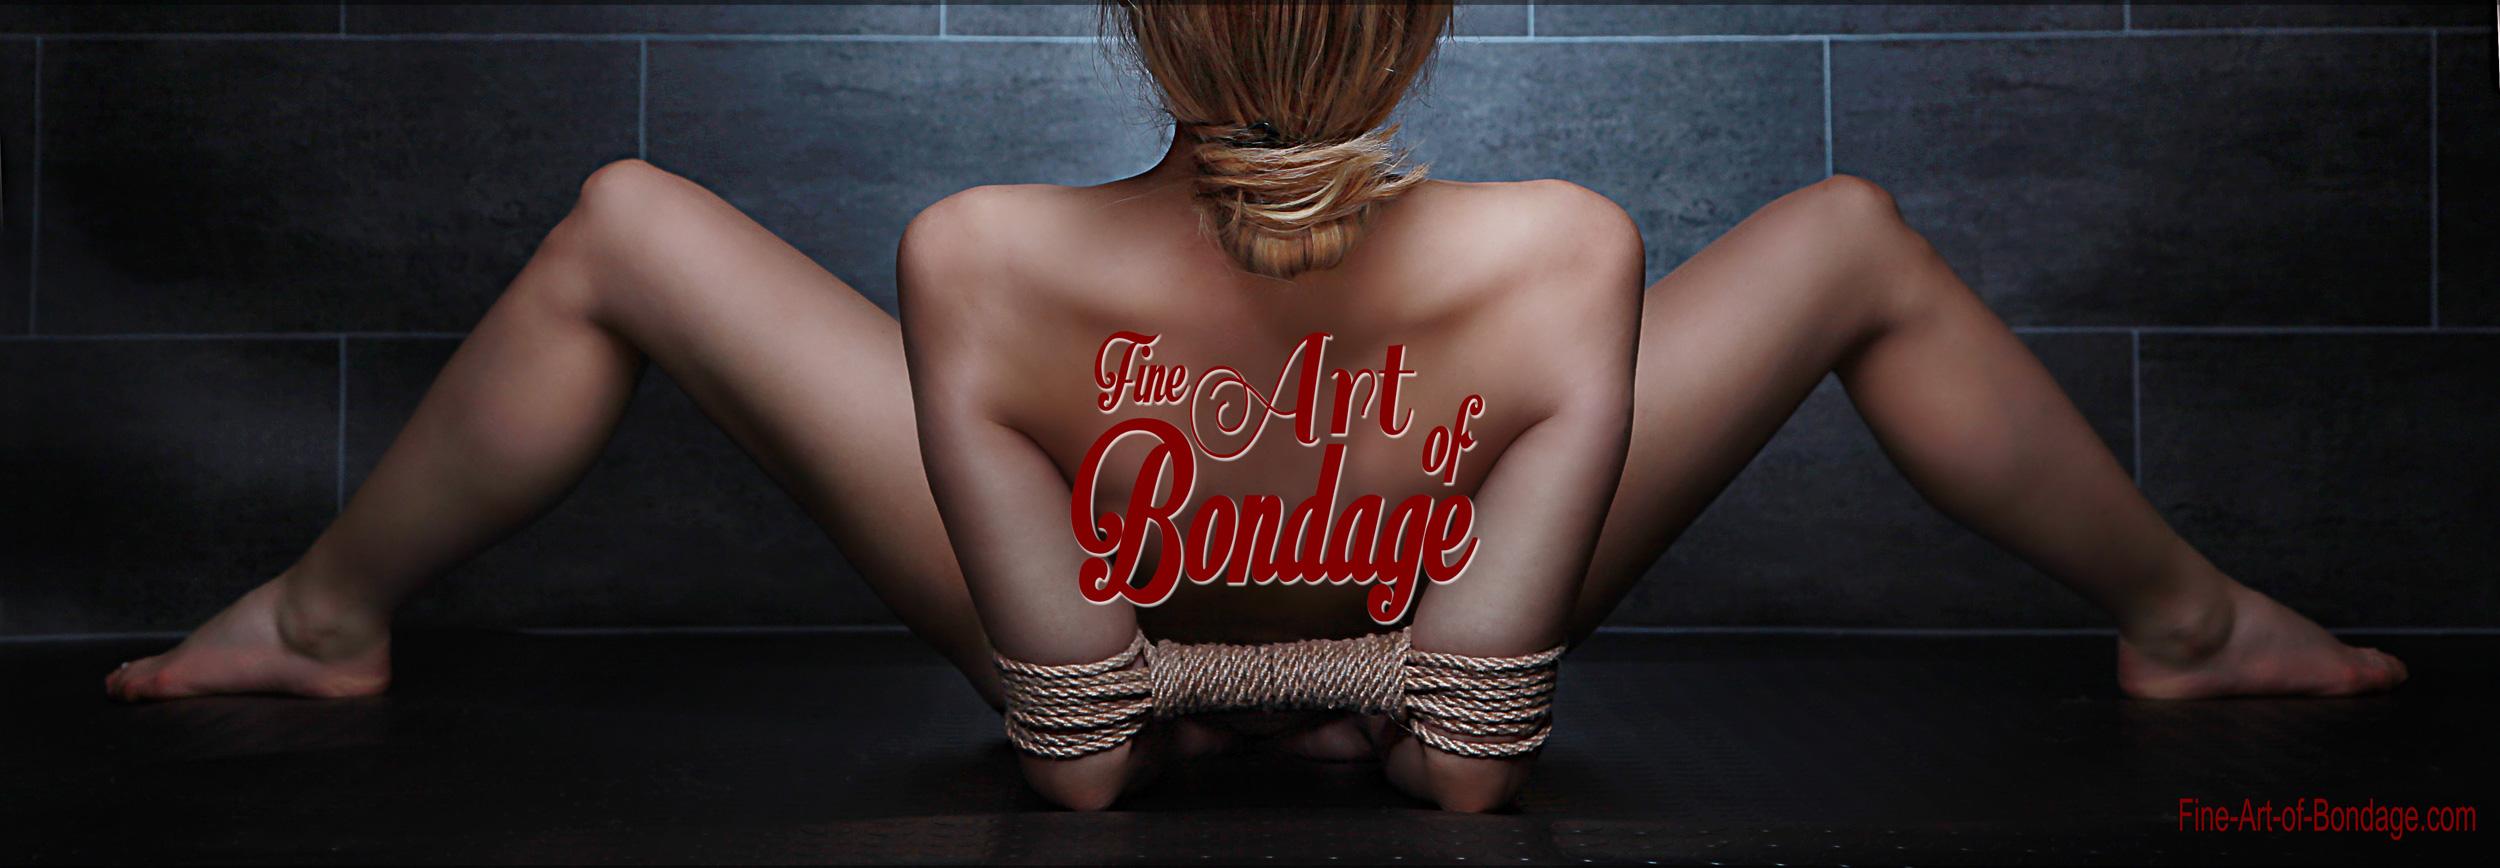 Tamilgirls oil massage porn photo